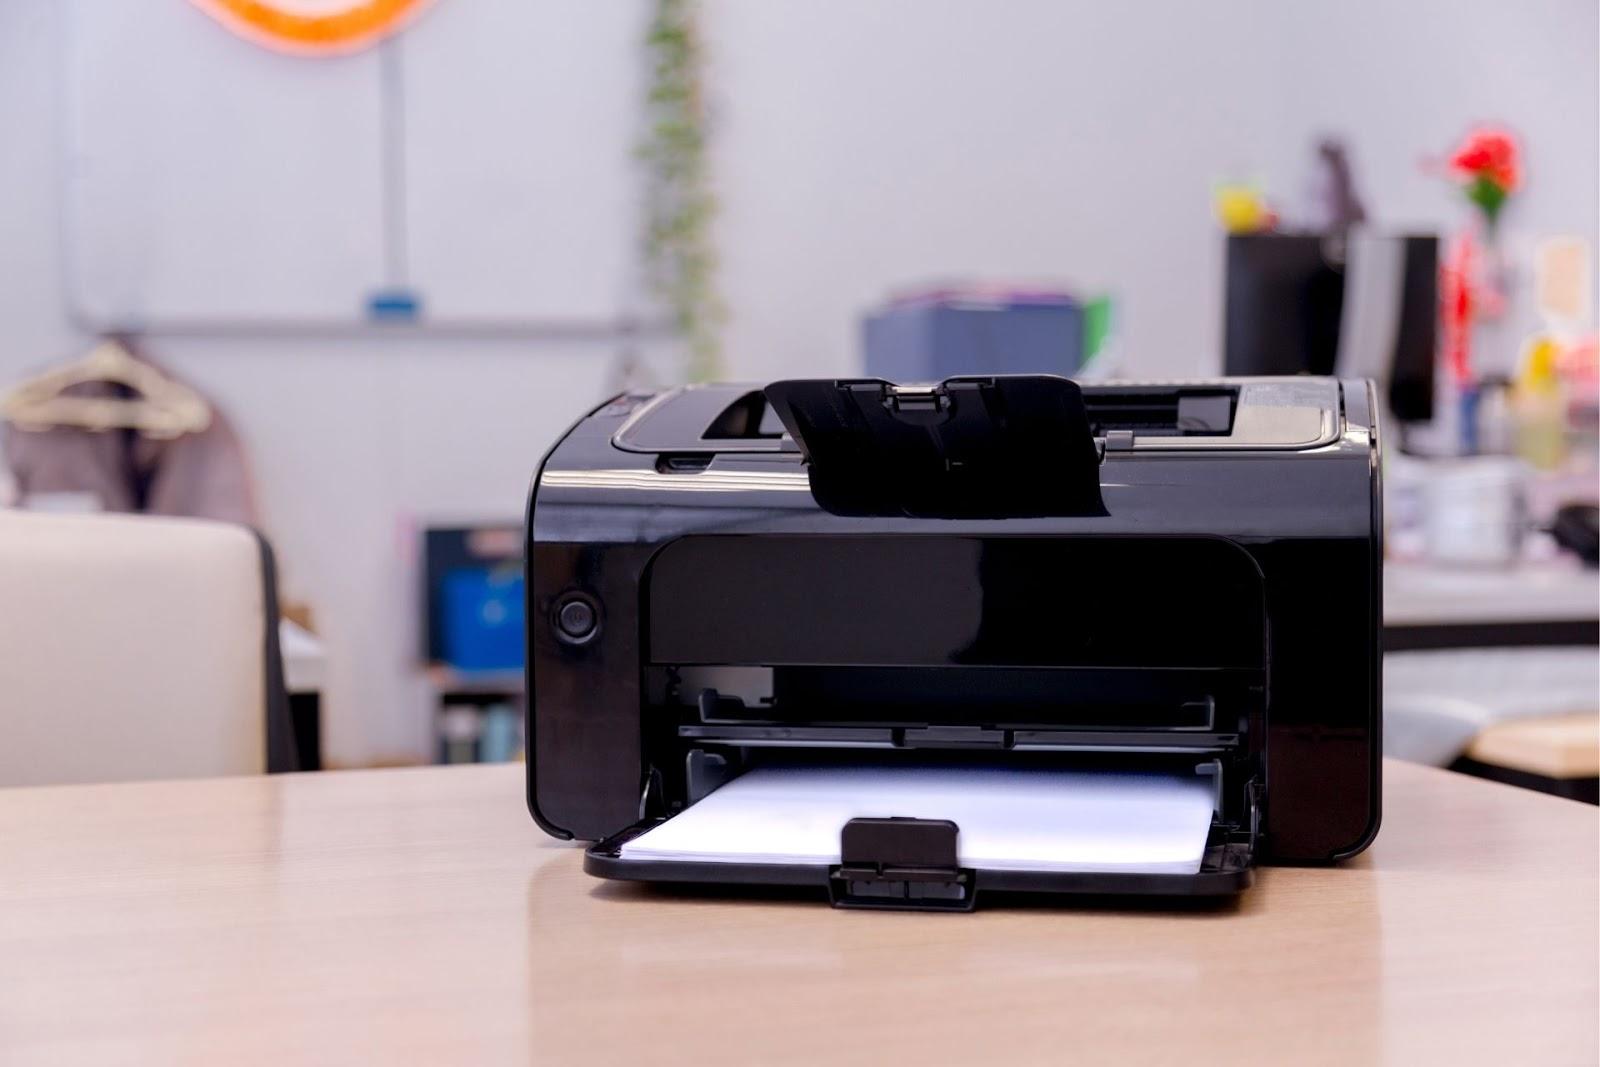 A black printer on a table